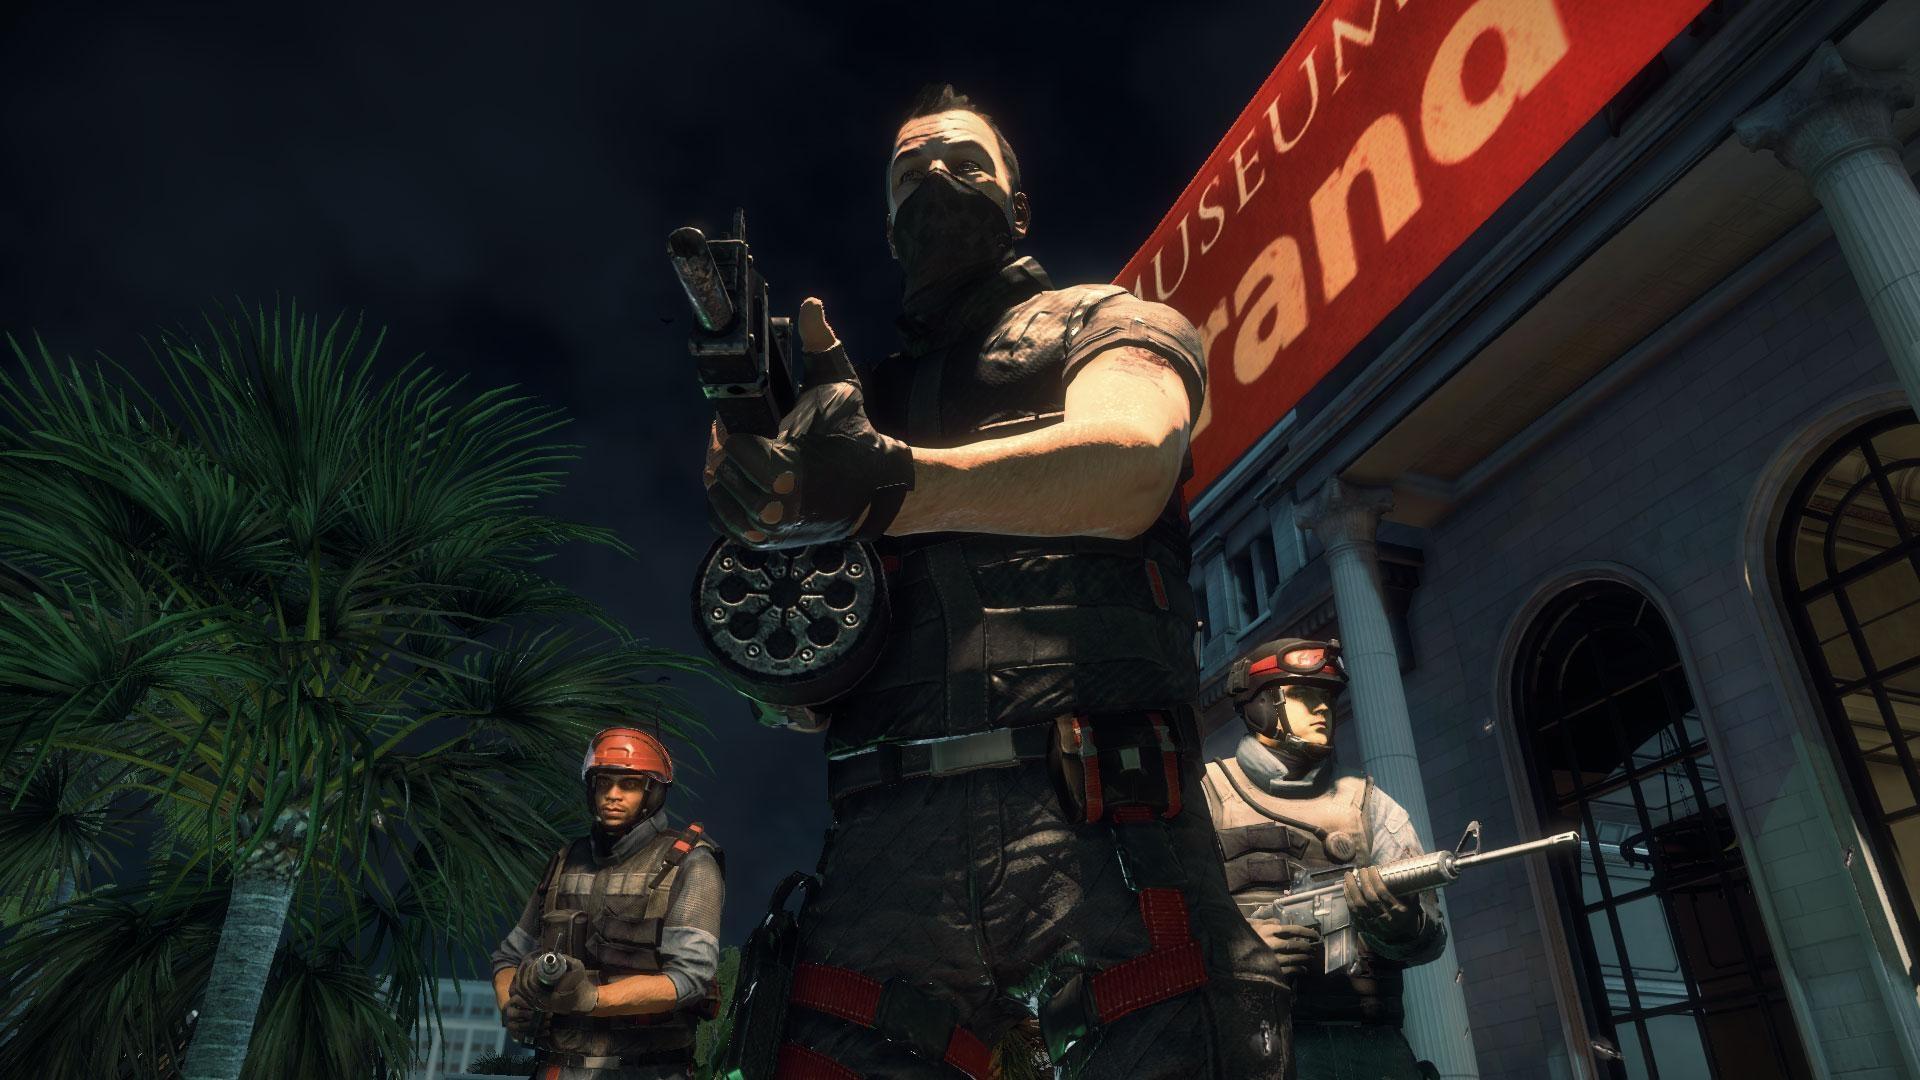 DeadRising3-OperationBrokenEagle Xbox One Editeur 008